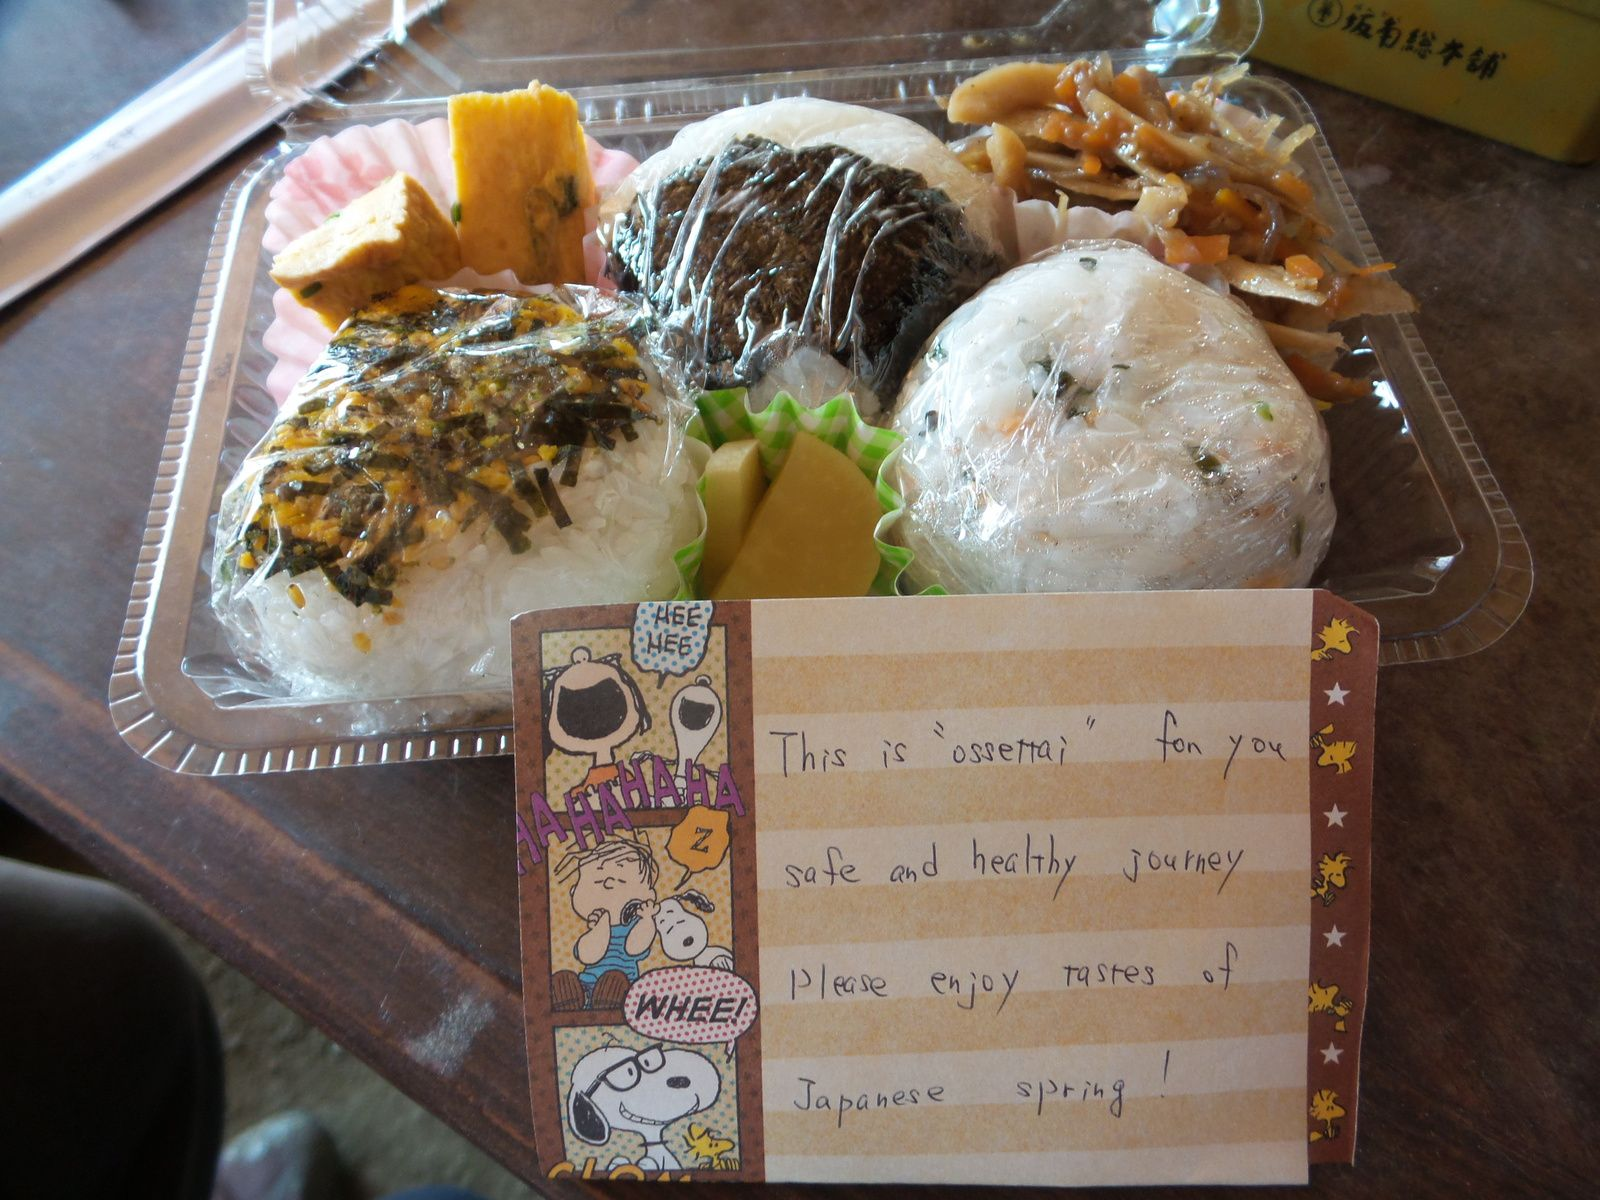 Chietro Ito nous offre une lunch box comme osettai